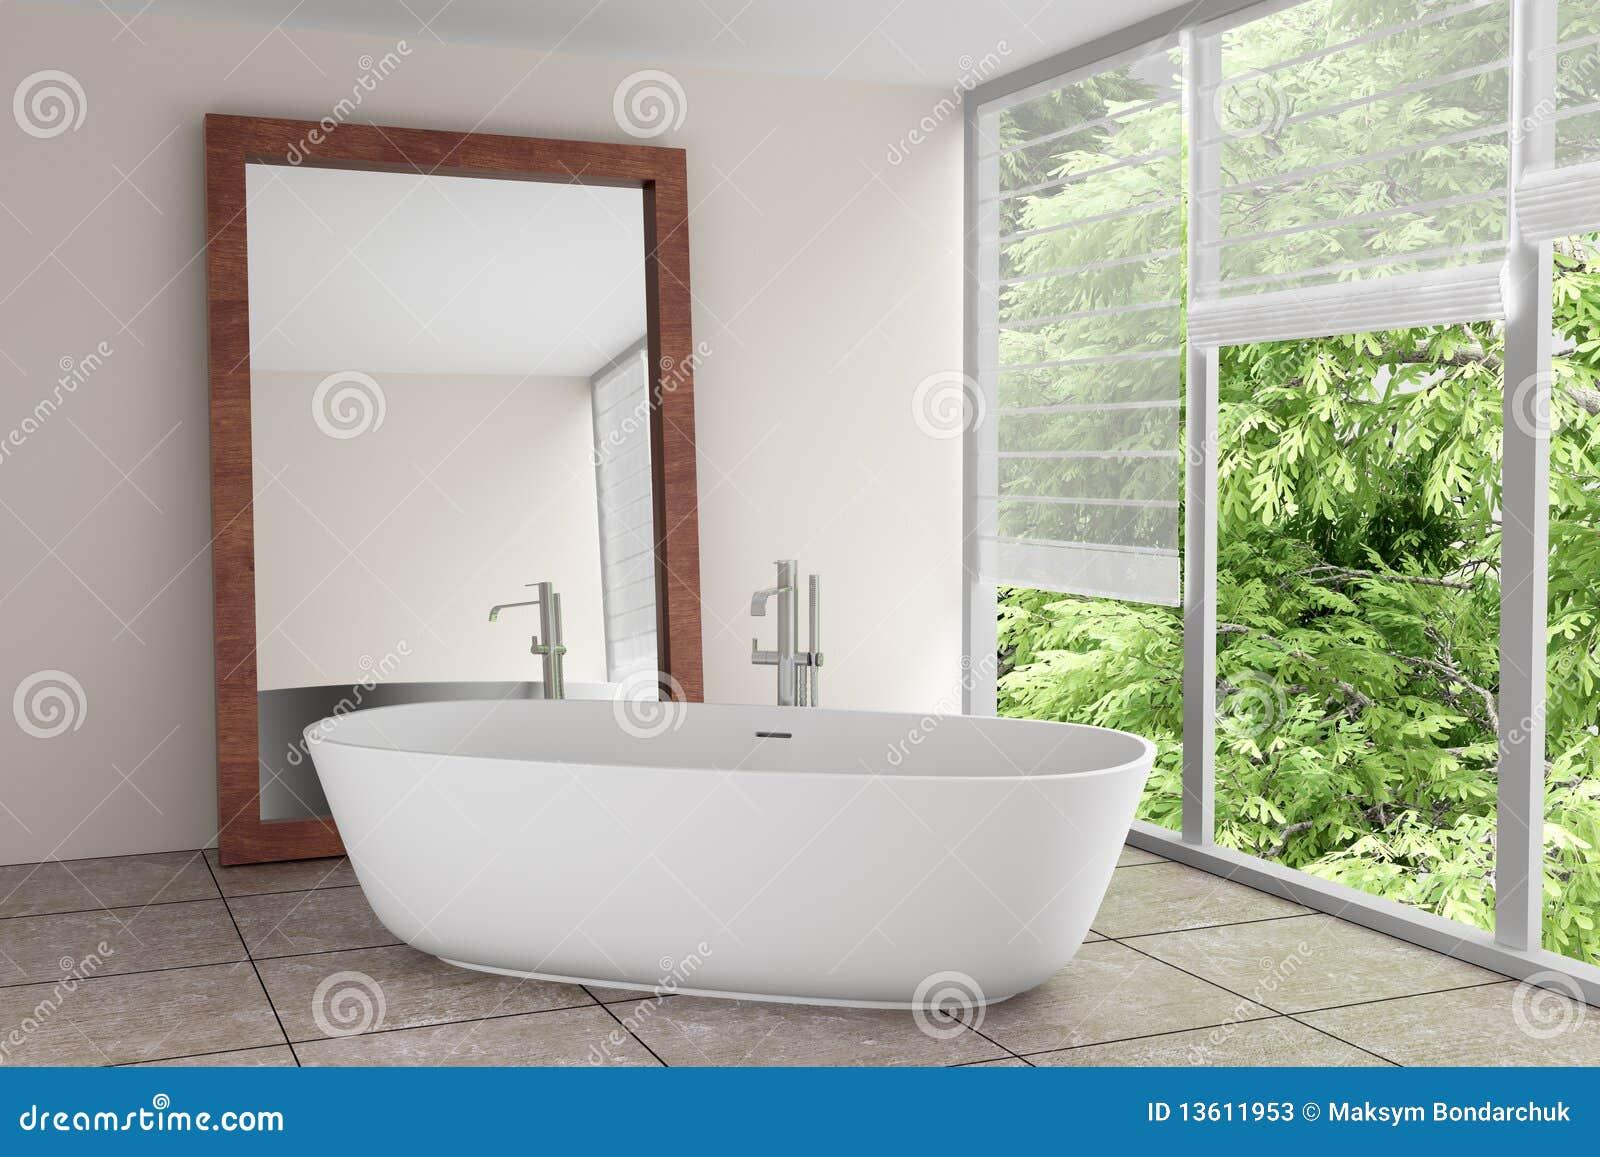 Spegel Foton – 217,606 Spegel Bilder, Fotografi & Bilder - Dreamstime